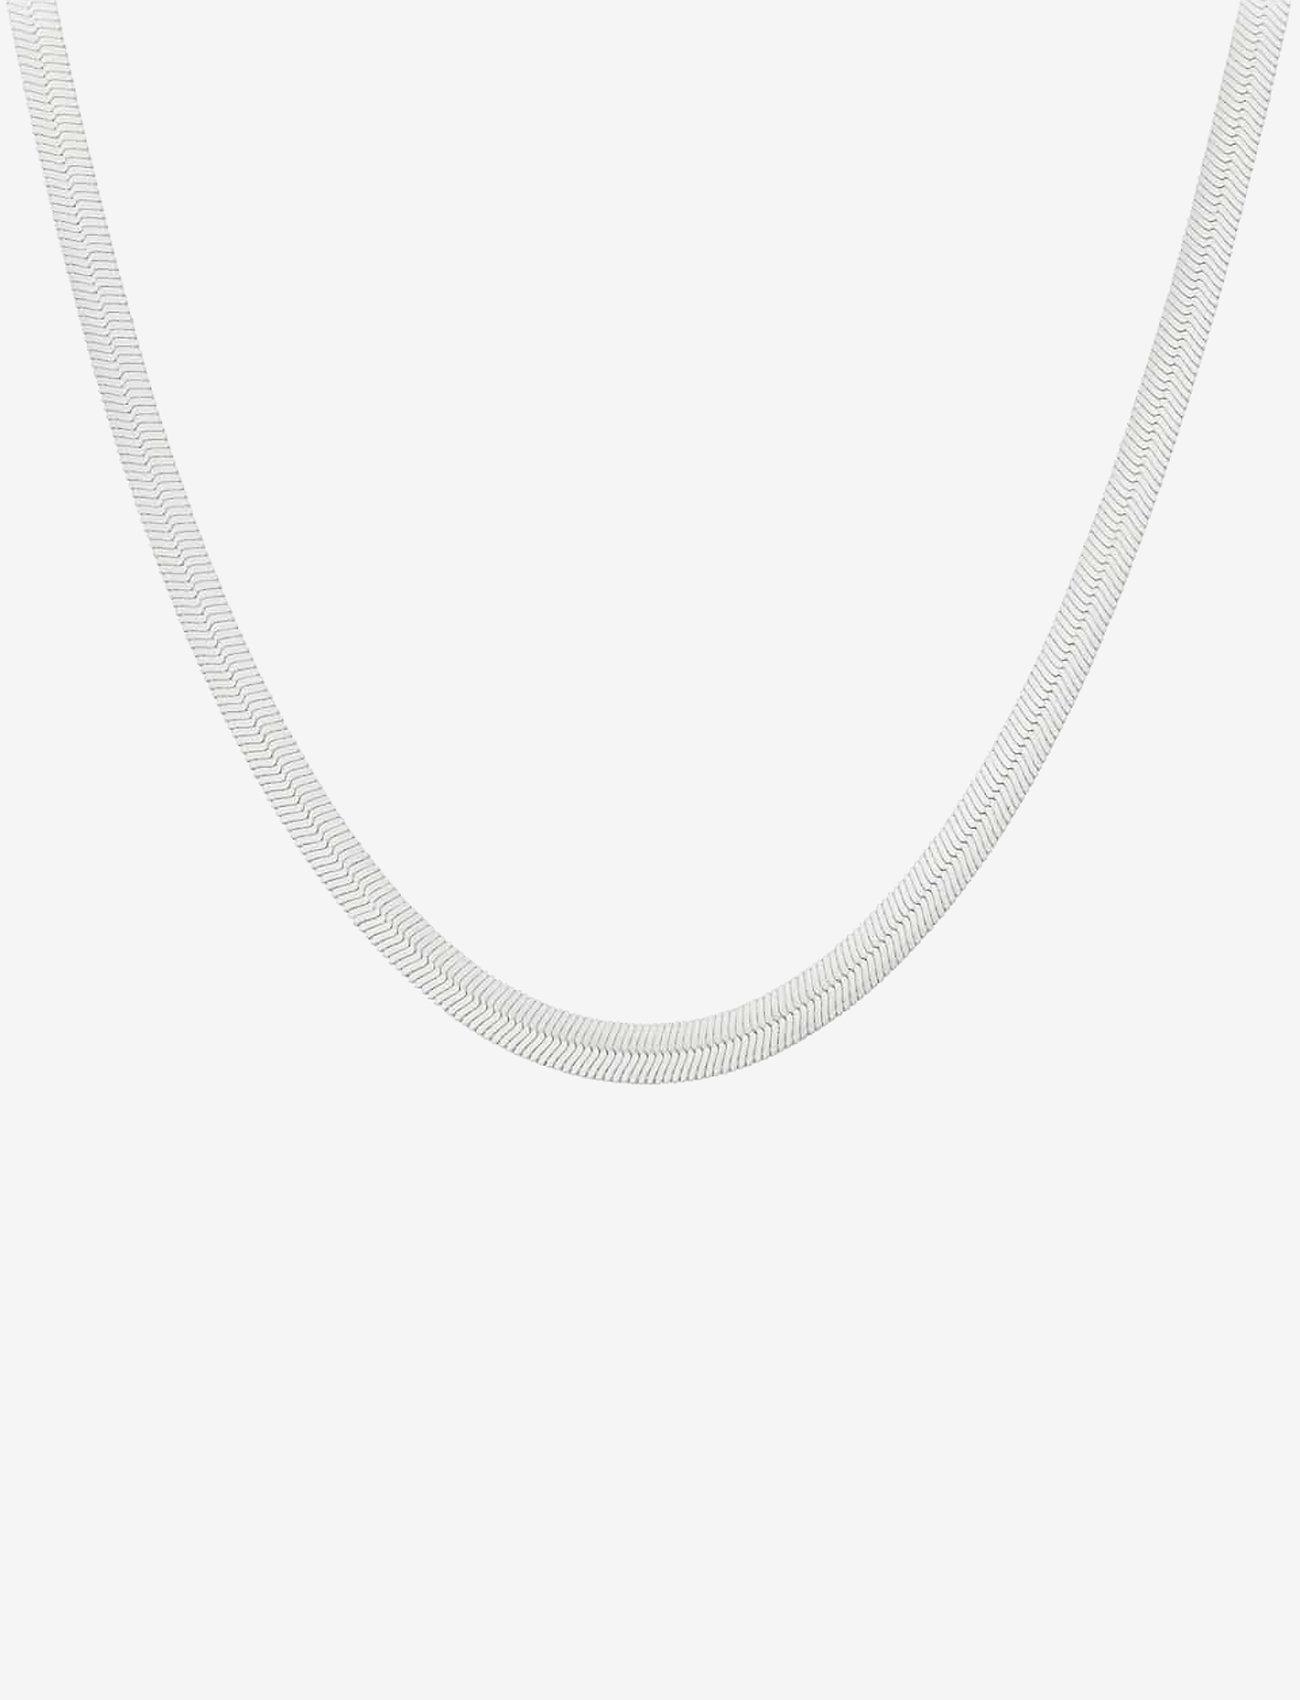 Pernille Corydon Edith Necklace Adj 47-52 cm - Biżuteria SILVER - Akcesoria